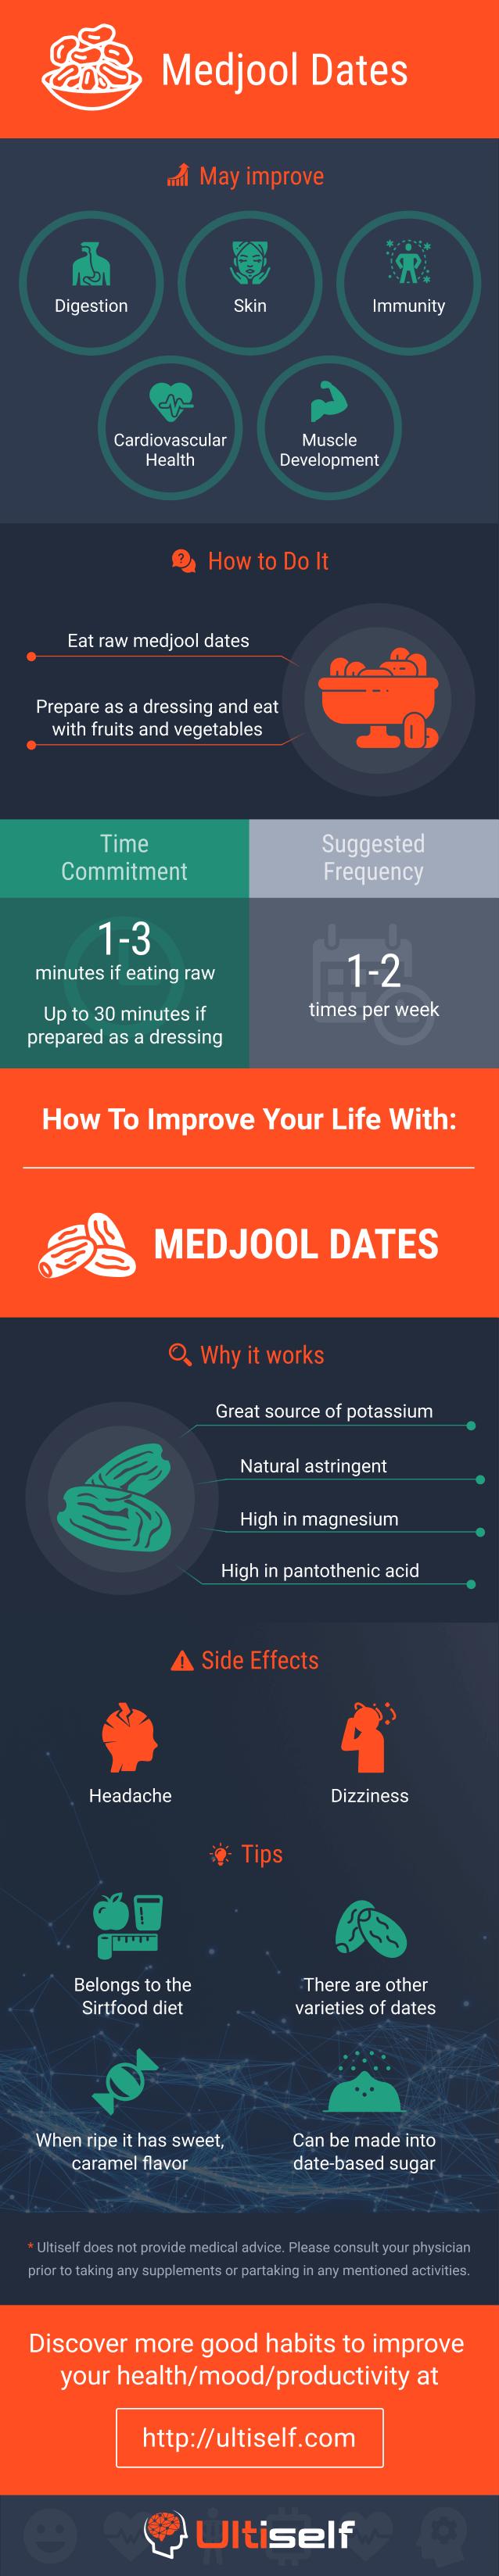 Medjool Dates infographic